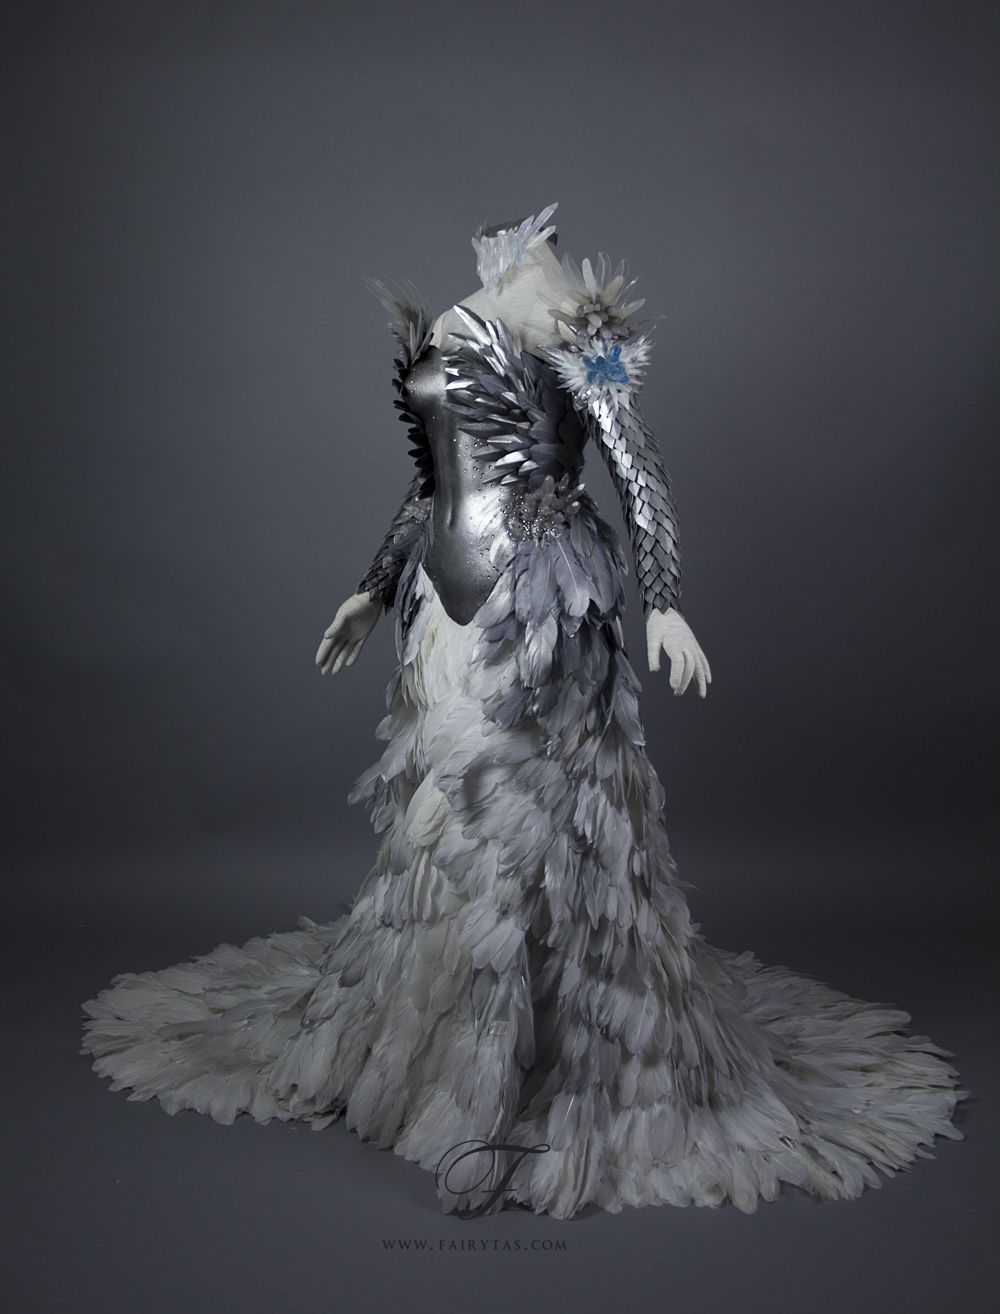 Crystal ice dragon